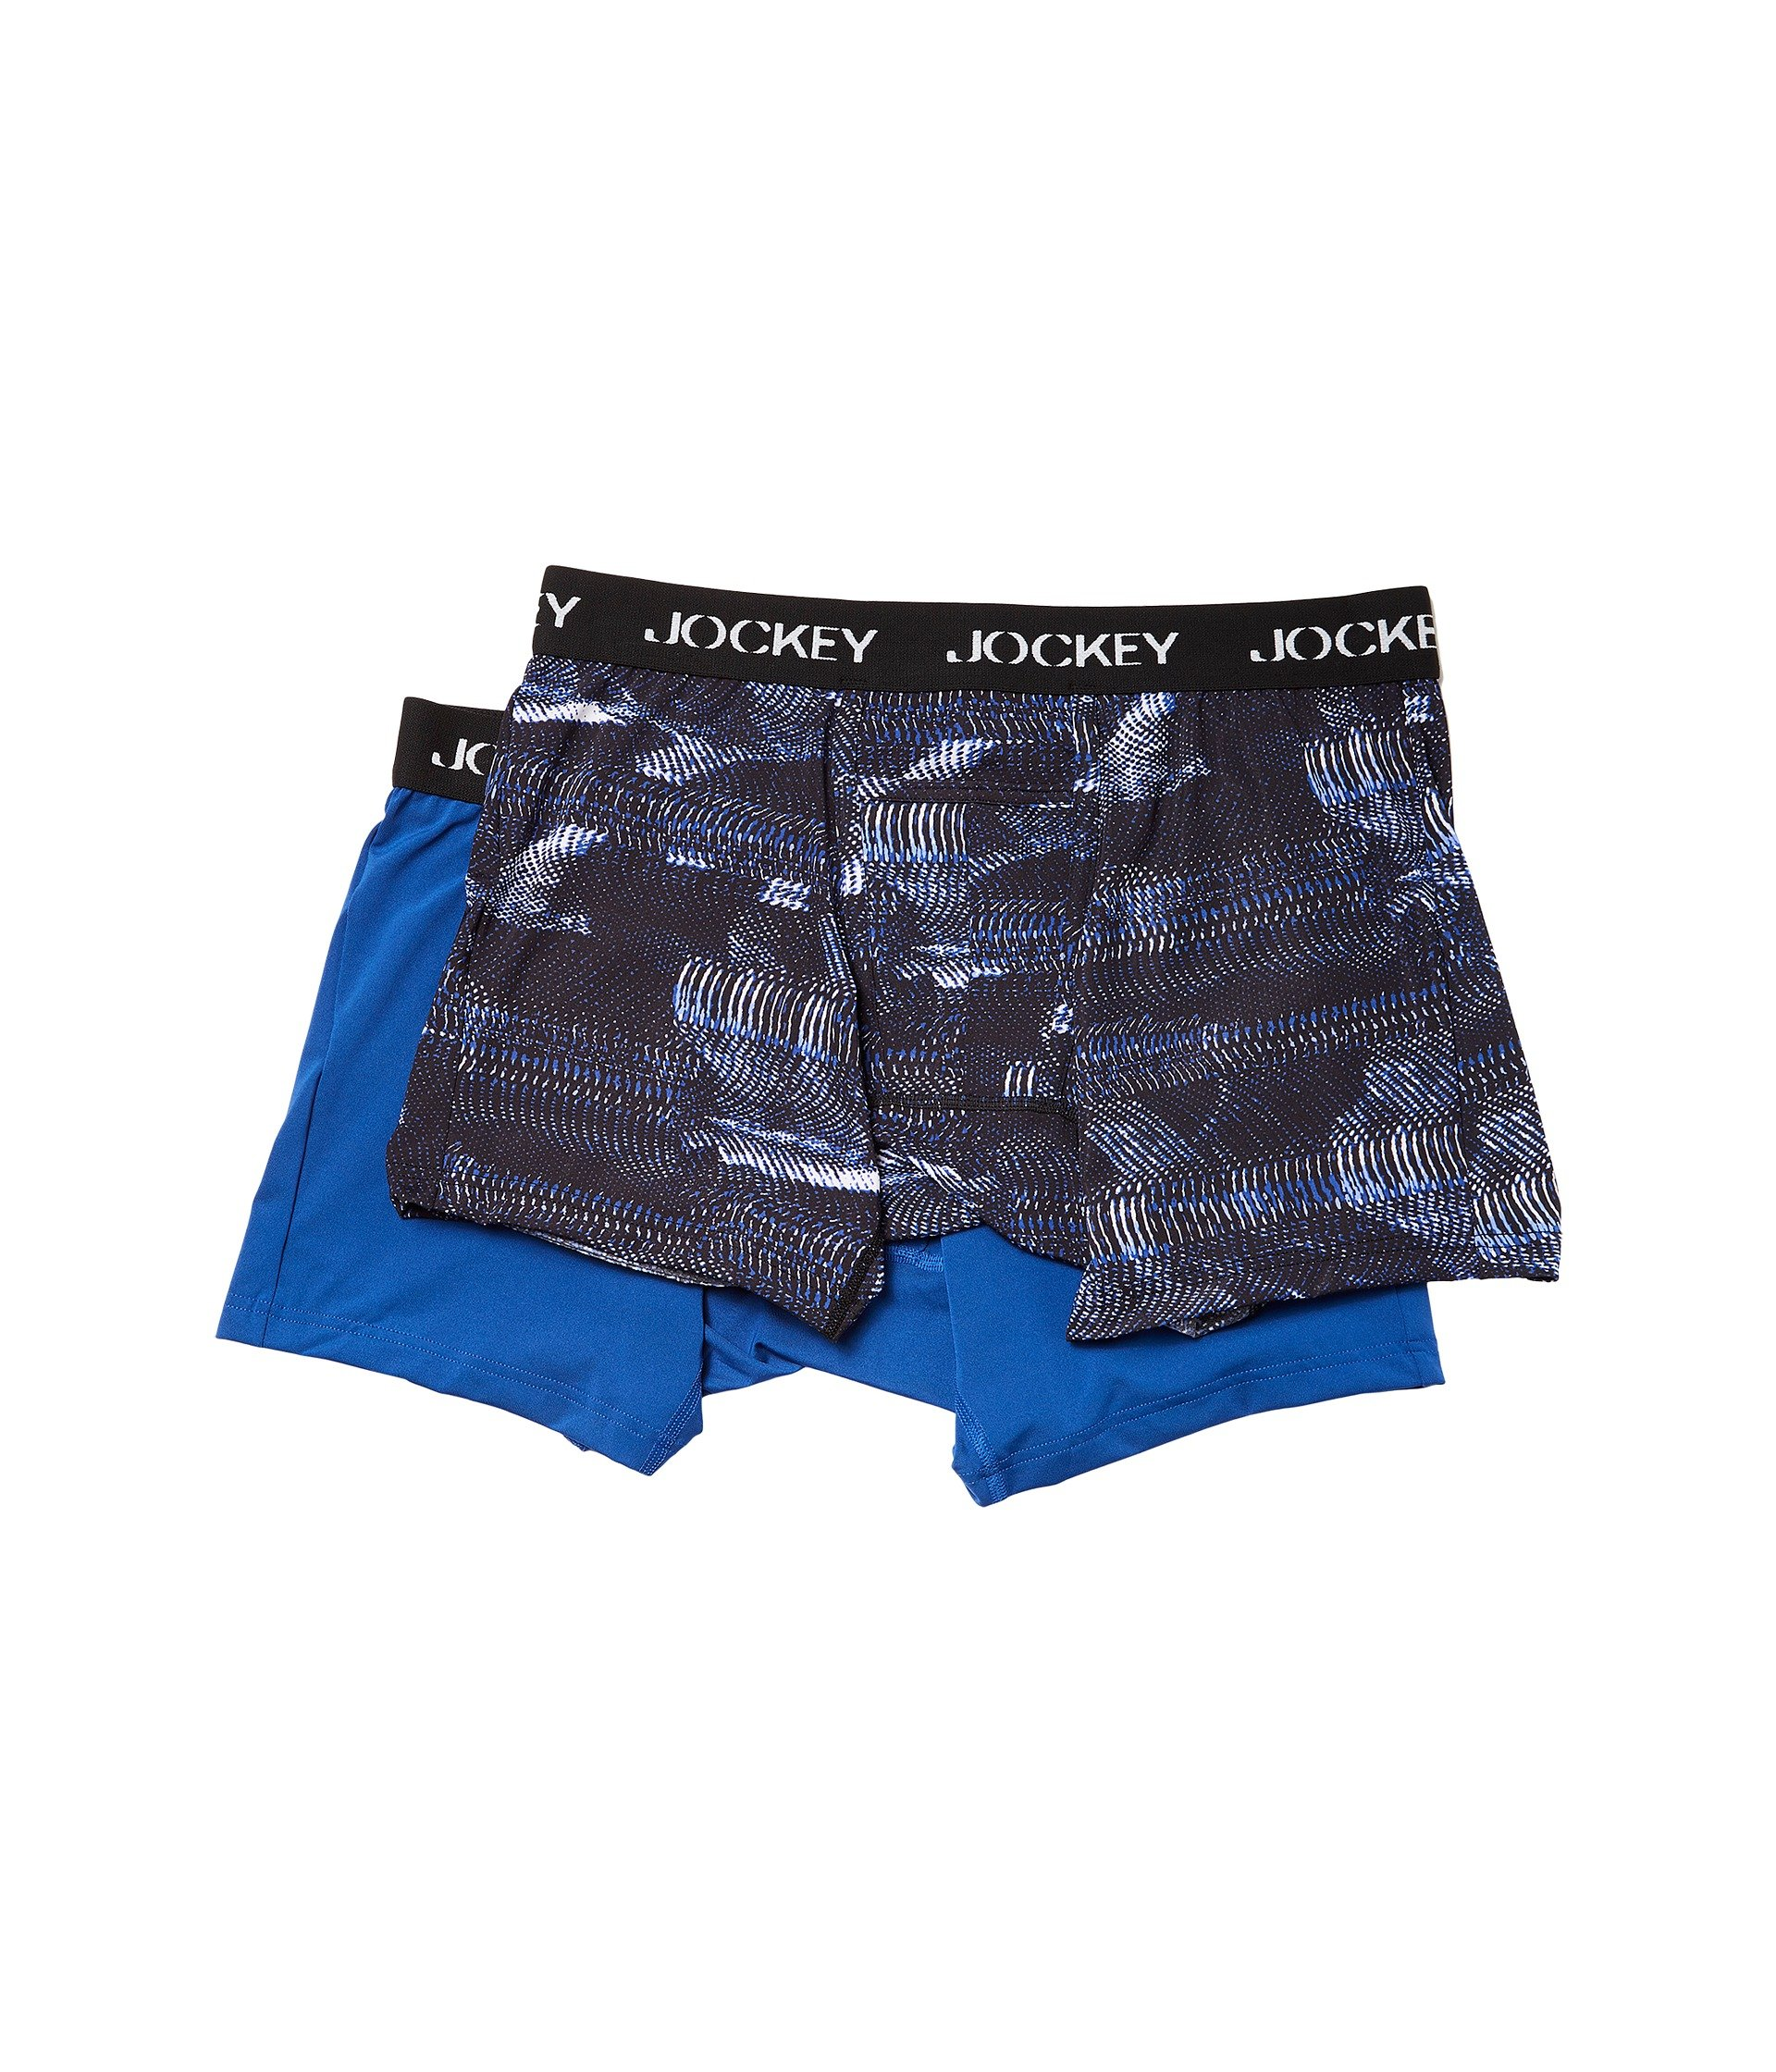 Jockey Men's Microfiber Performance Boxer Brief 2-Pack Digital Vibe Blue/Medium Blue Medium